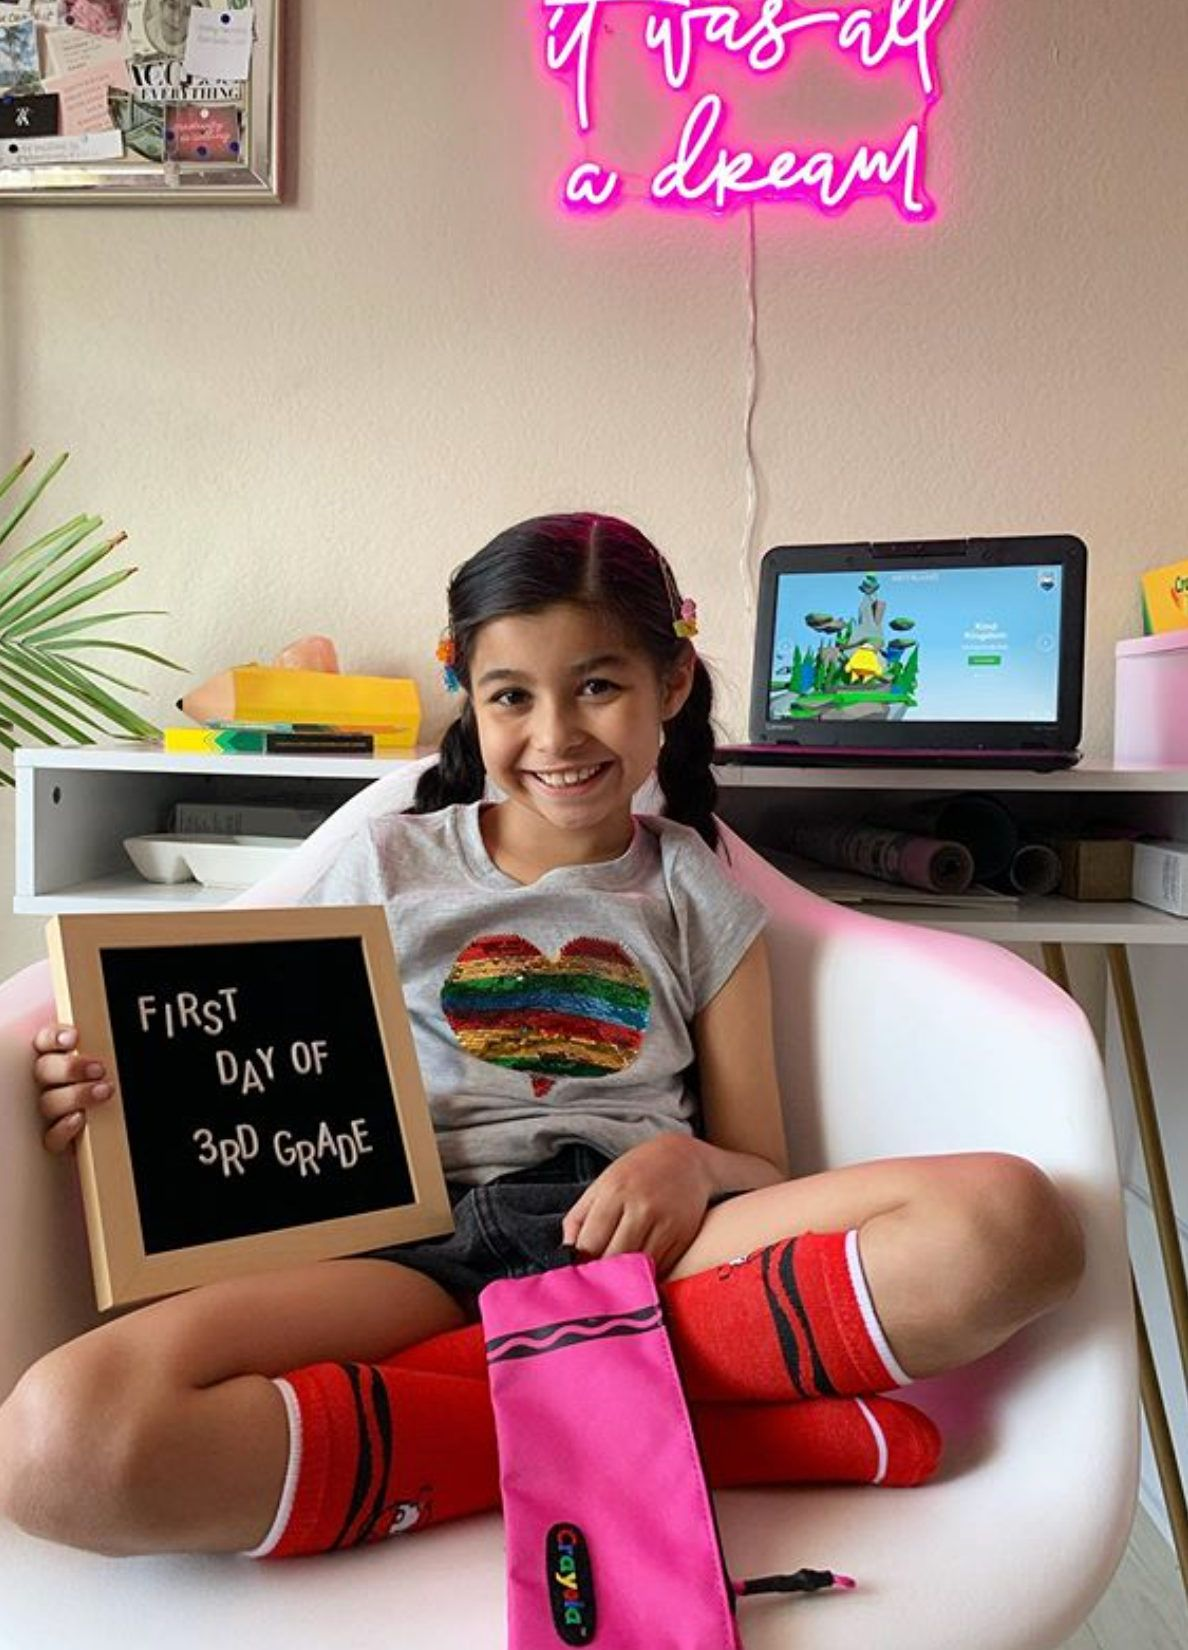 Back to school in #crayolafashion! We love to see your #crayola style! Repost: #crayolafashion #wearcreativity #kidsofinstagram #crayola #creativity